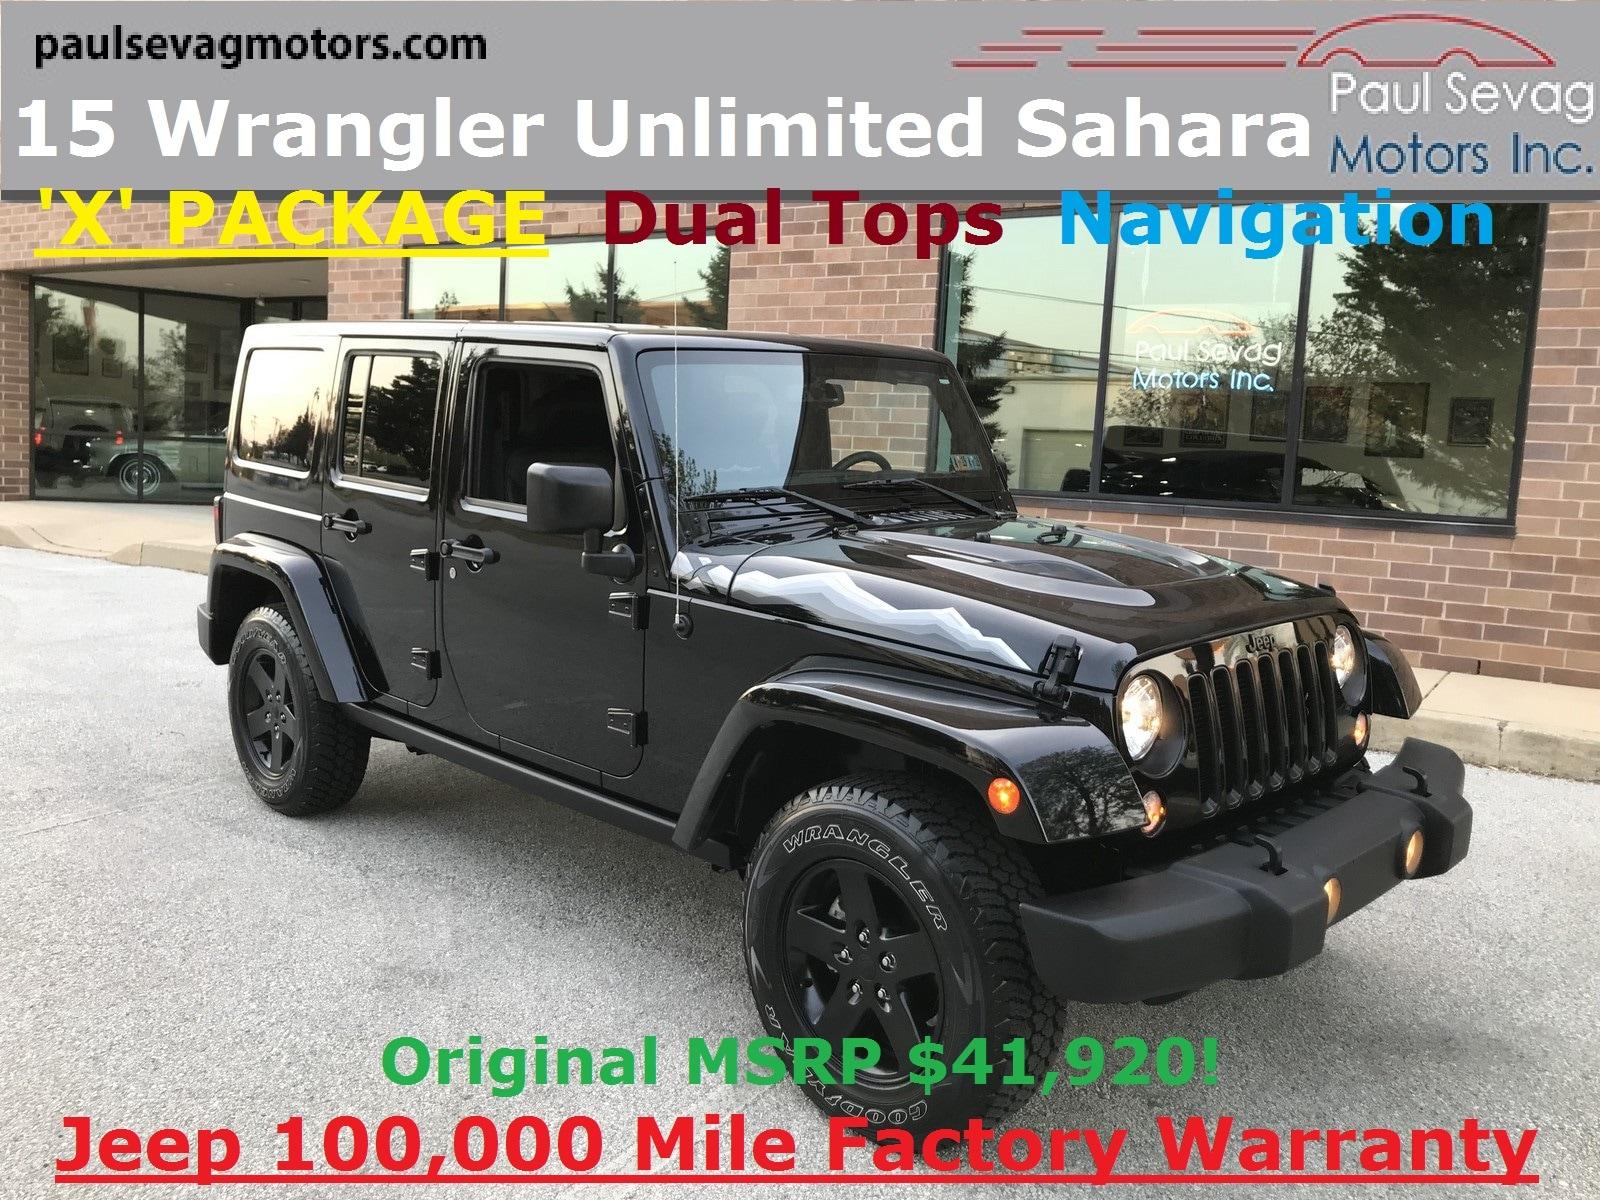 2015 Jeep Wrangler Unlimited Sahara 4x4 'X' PACKAGE/Dual Tops/Navigation SUV